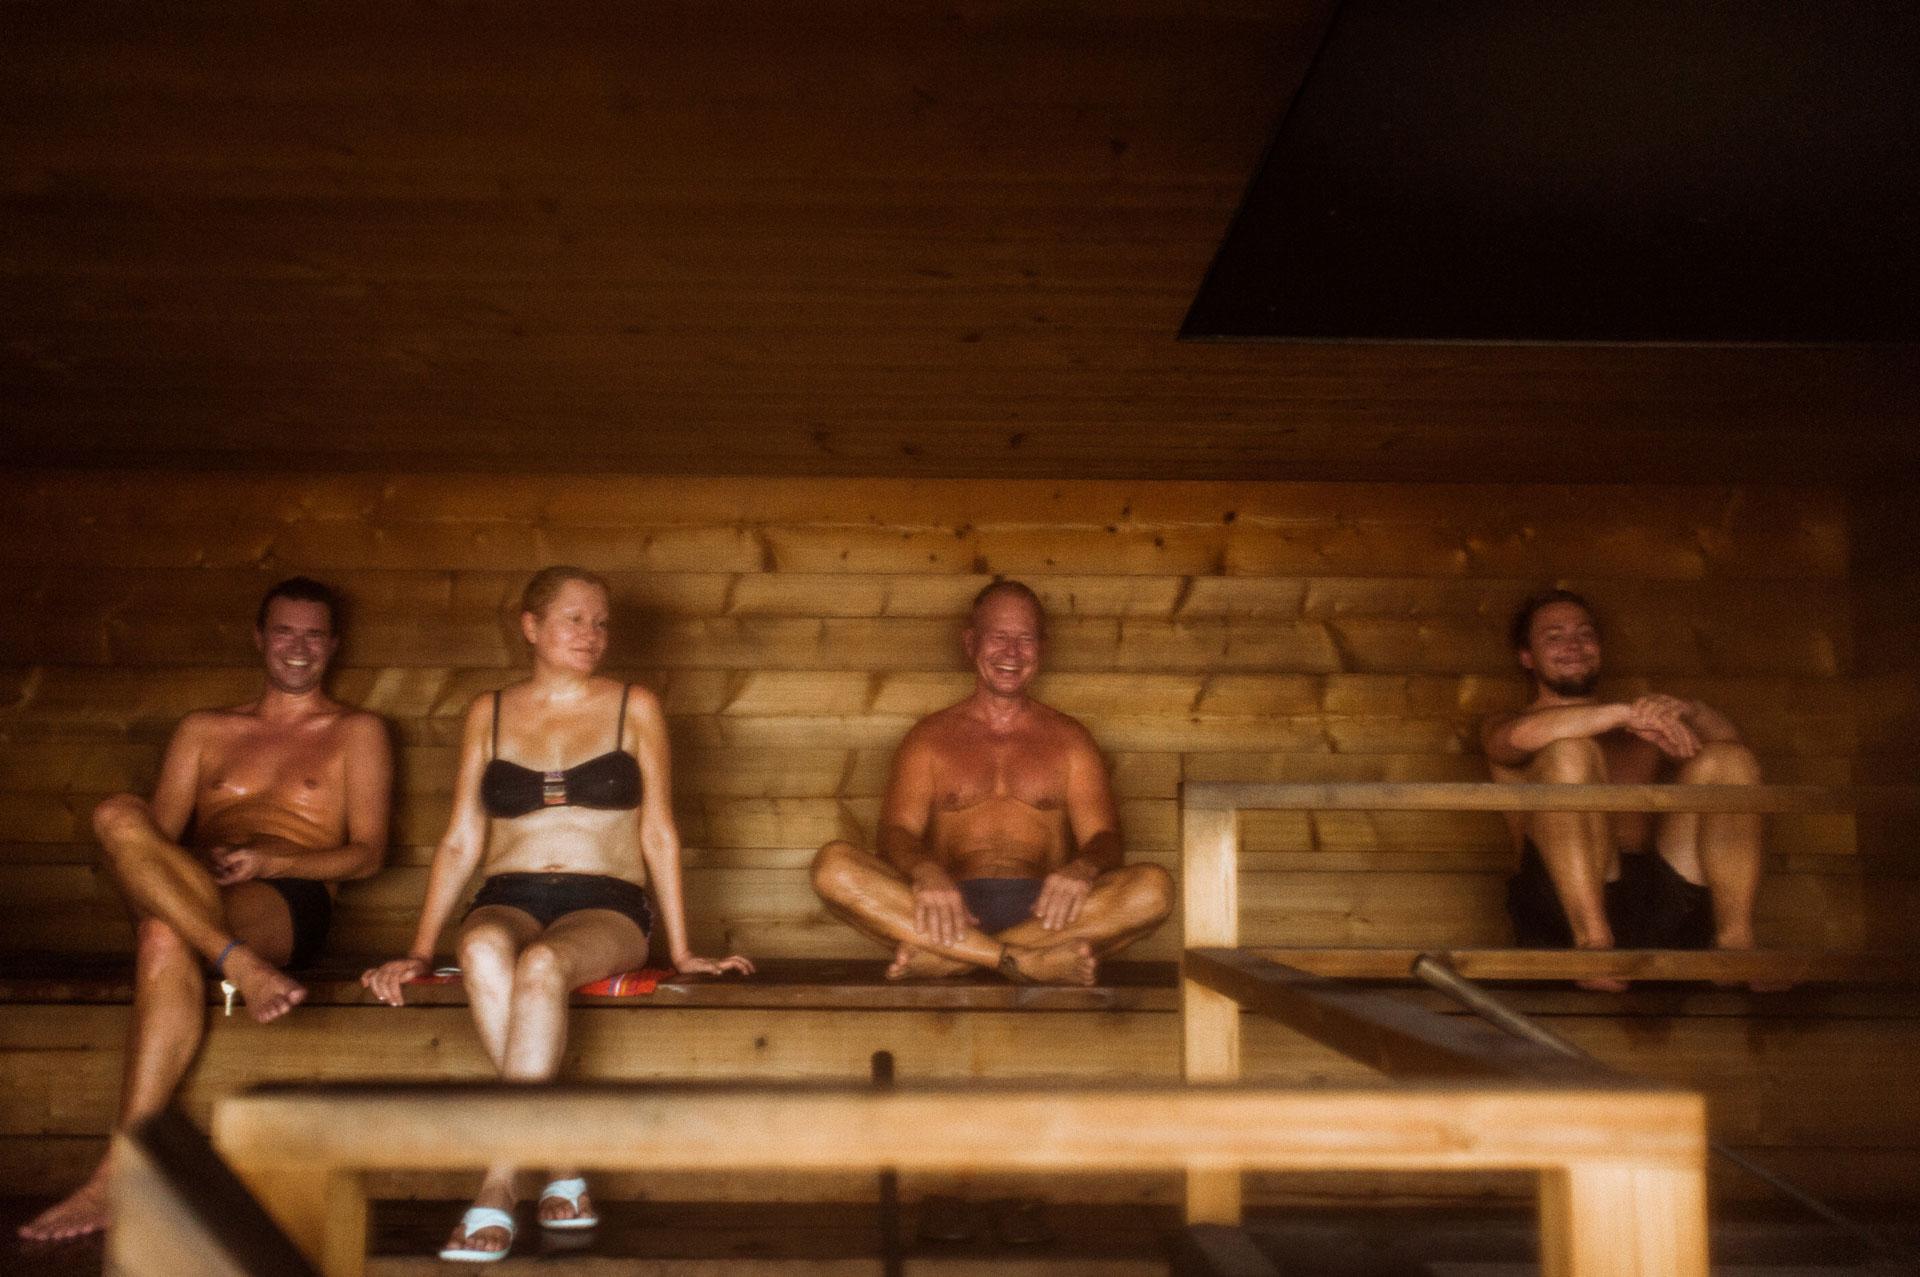 suomi saunoo finland goes to sauna my helsinki. Black Bedroom Furniture Sets. Home Design Ideas